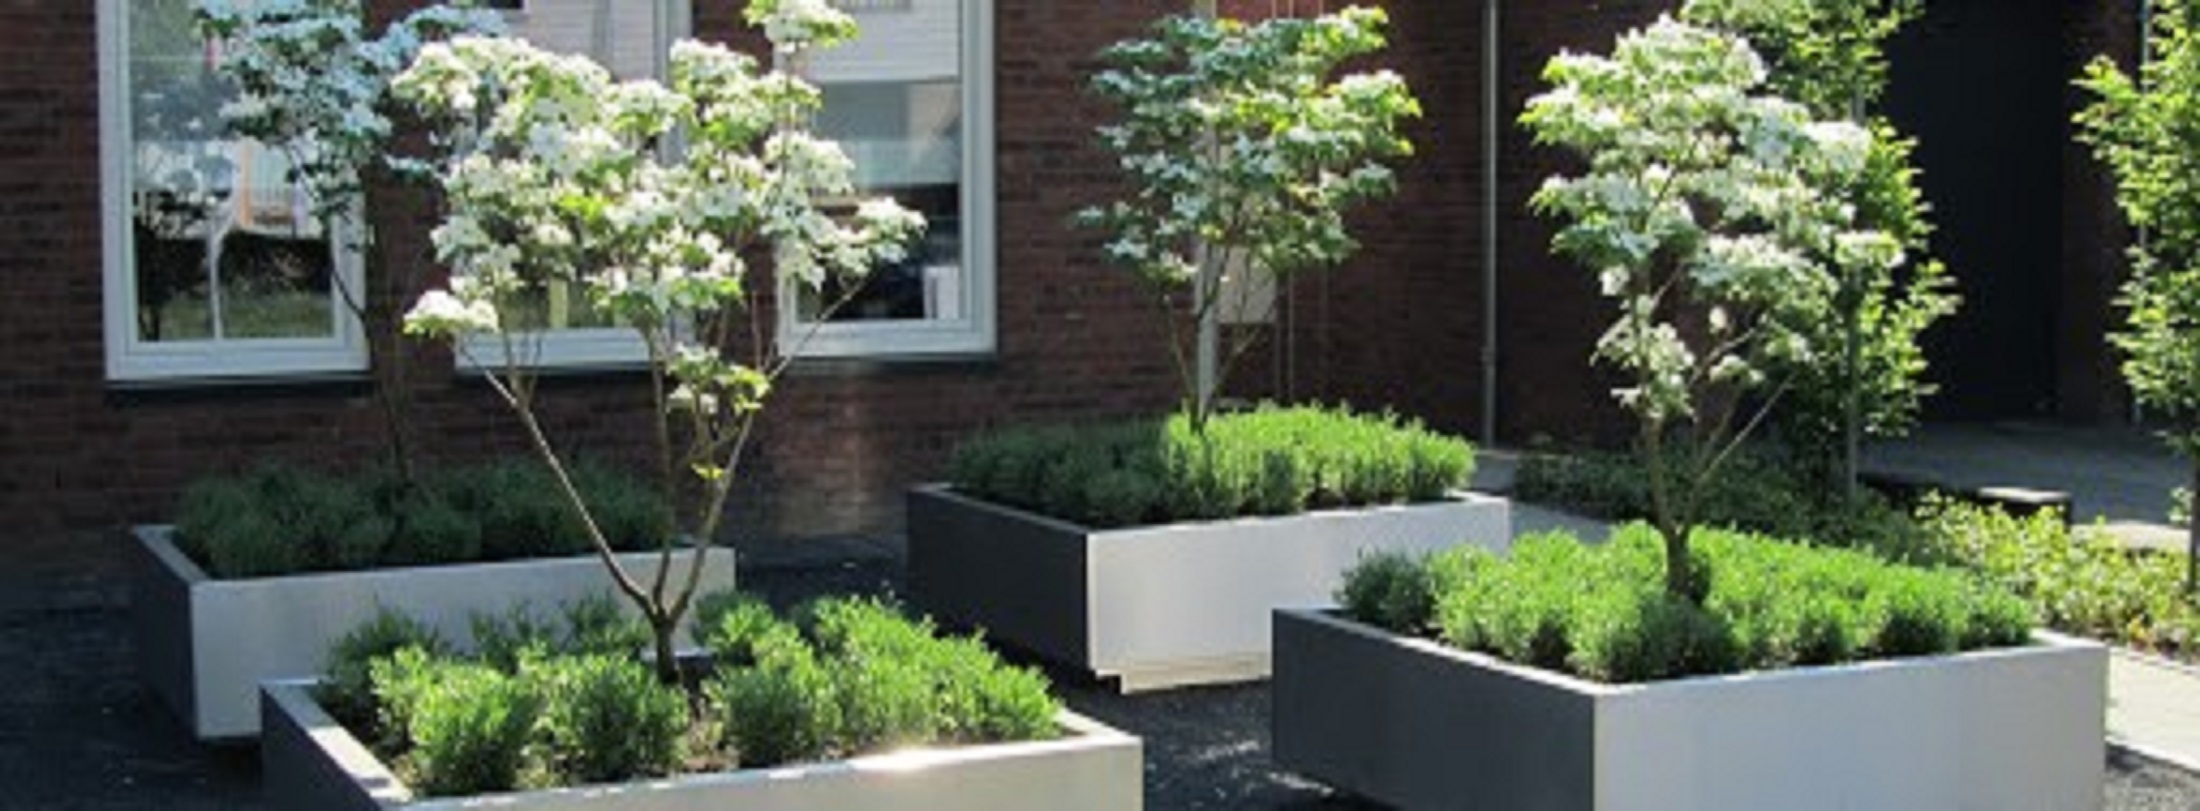 RVS plantenbakken sfeer